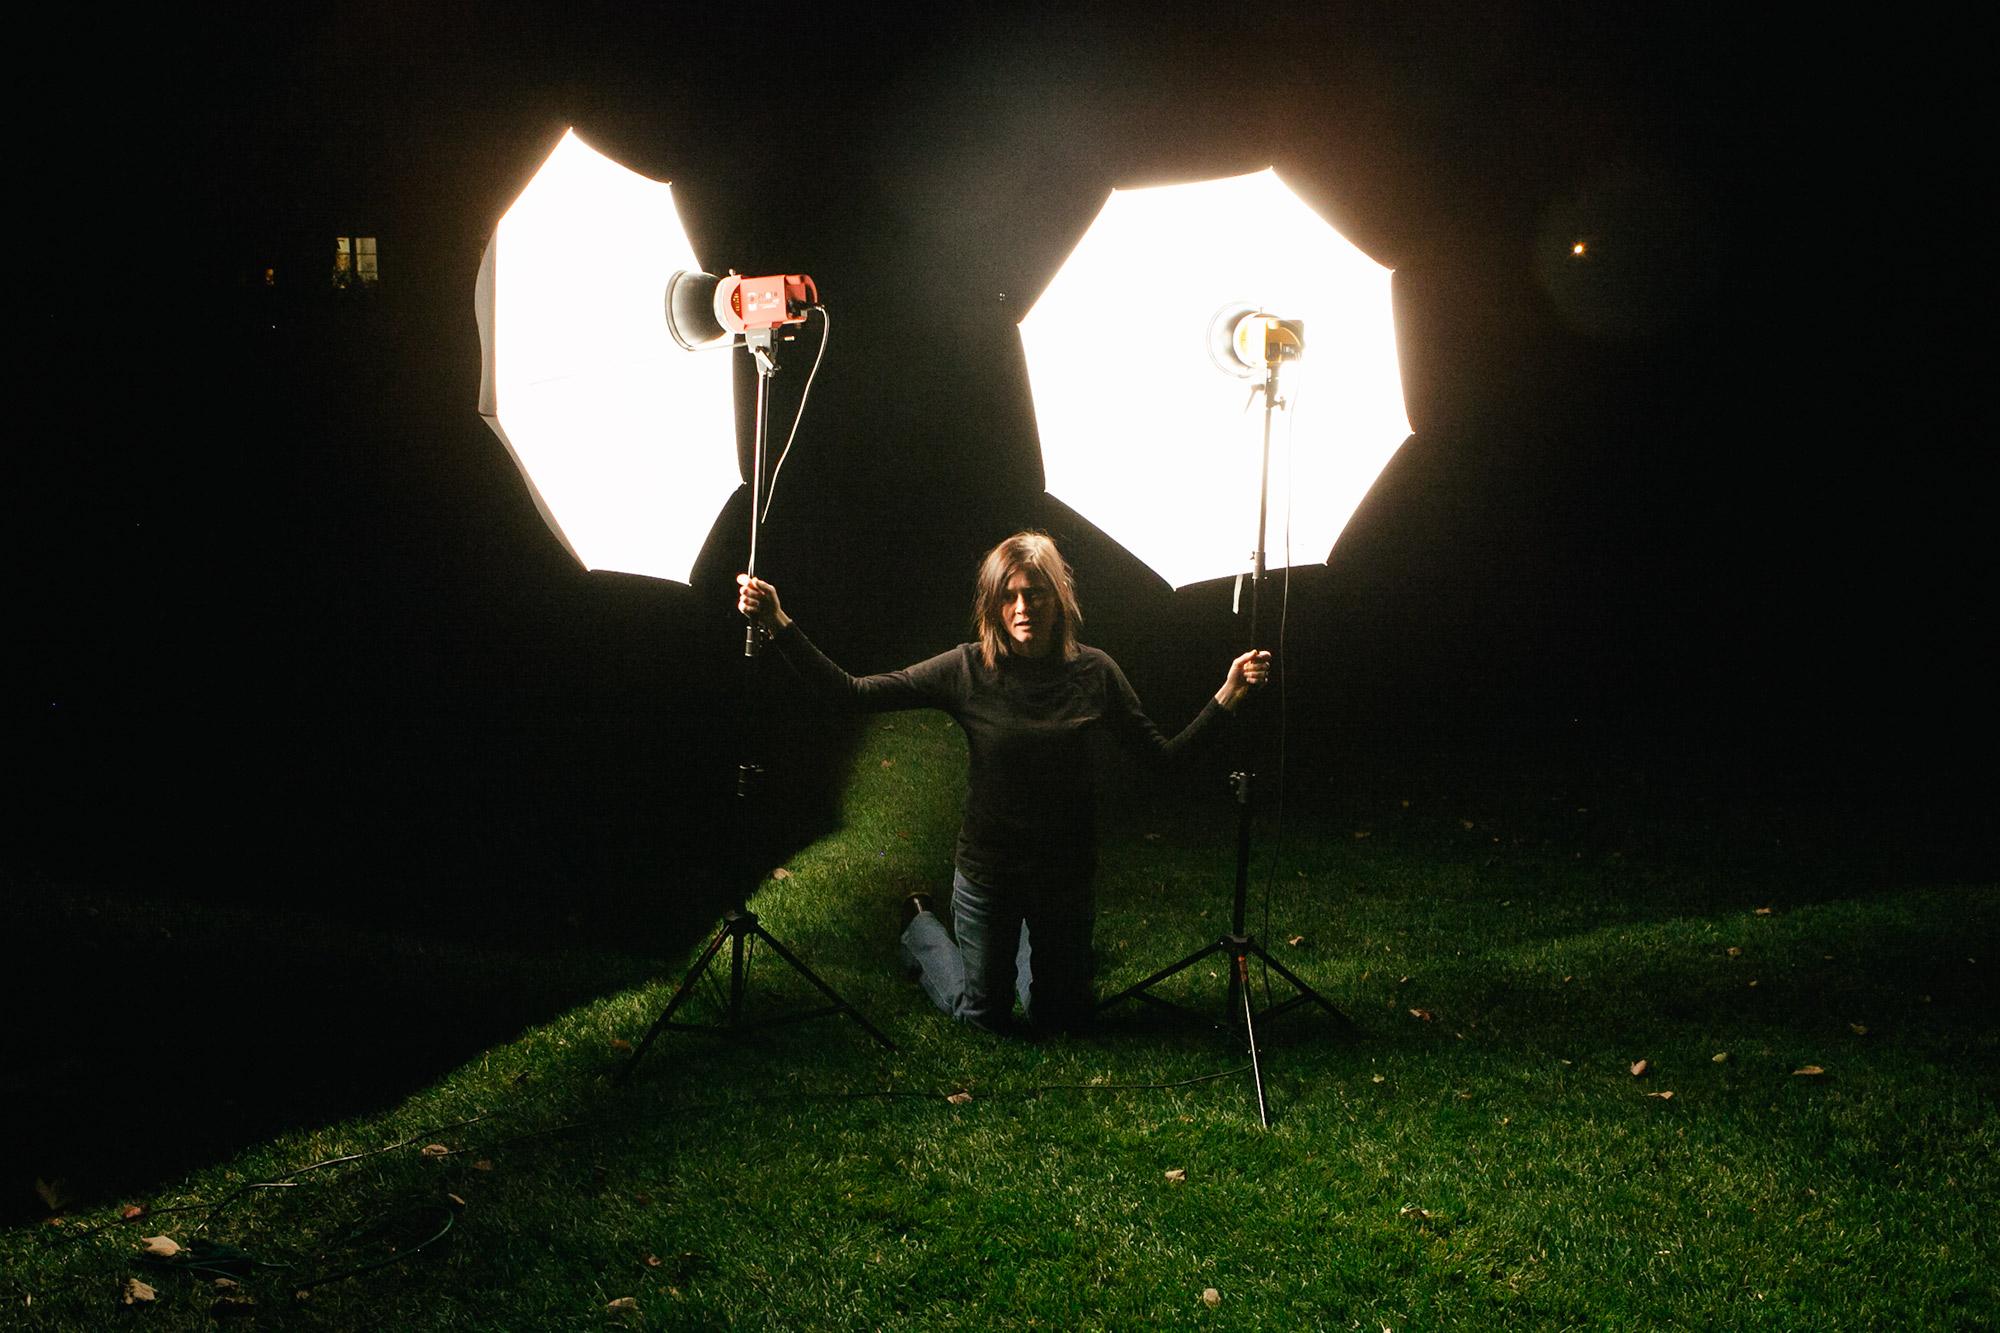 Sam, holding down the lights